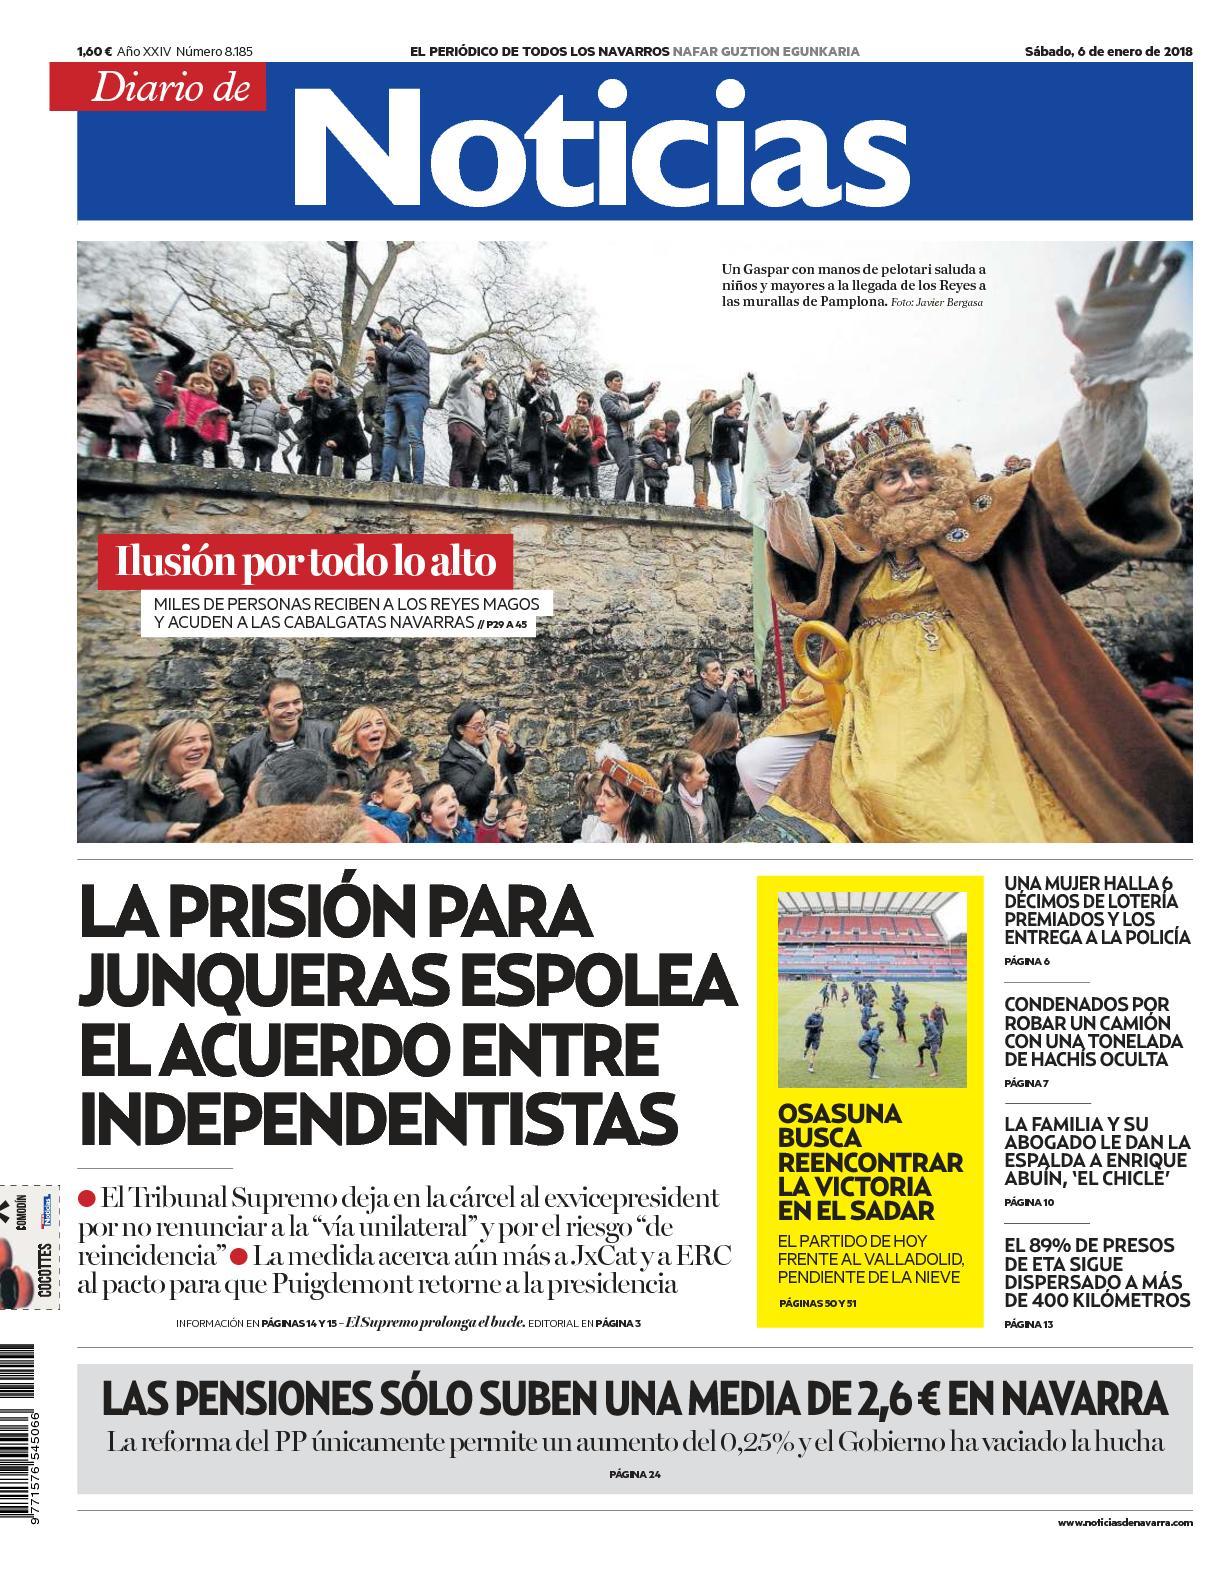 7d para bajar de peso precio ecuador newspapers